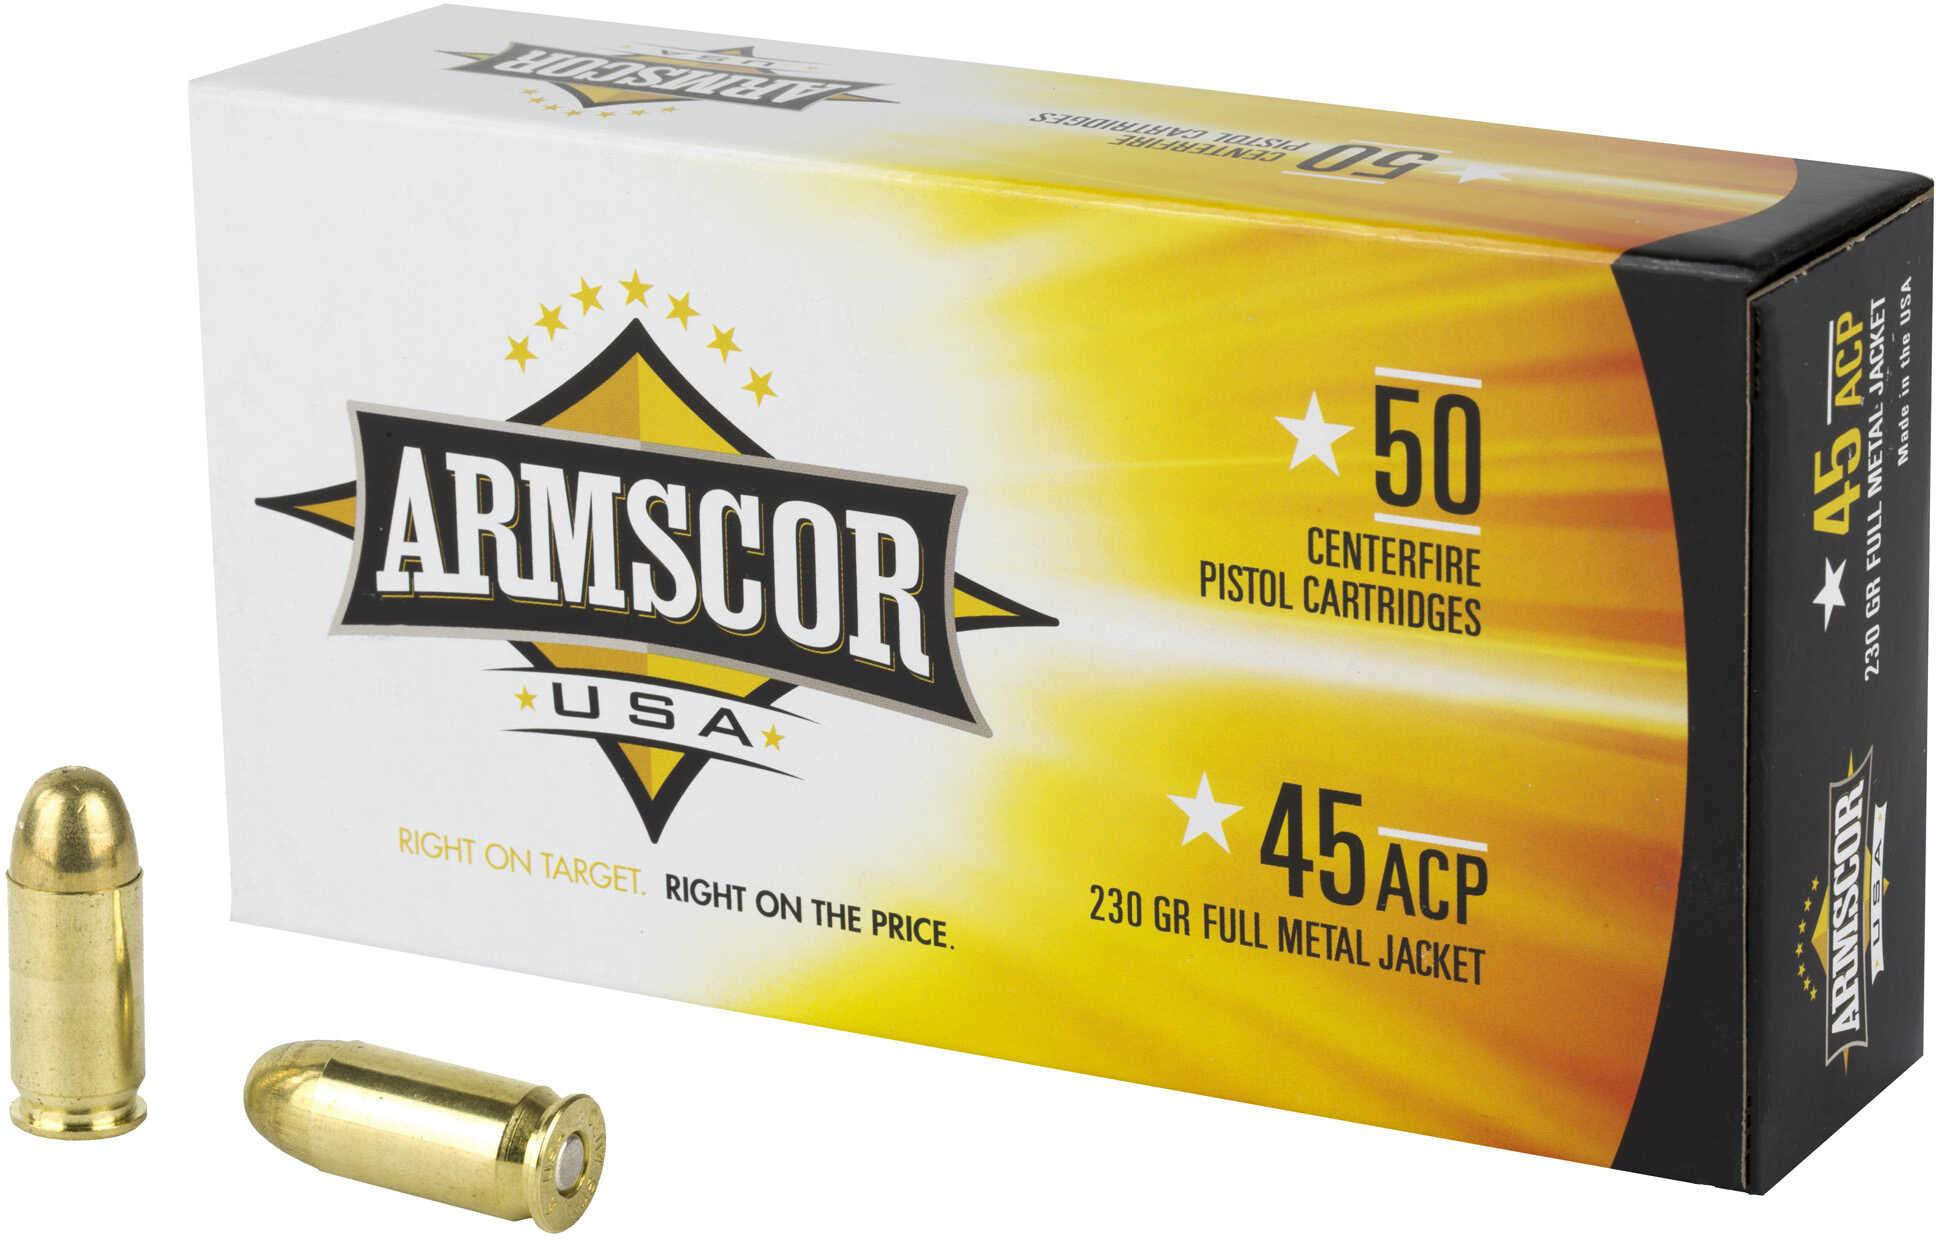 Armscor 45 ACP Full Metal jacket 230 Grain Ammunition 50 Rounds Per Box Md: FAC4512N